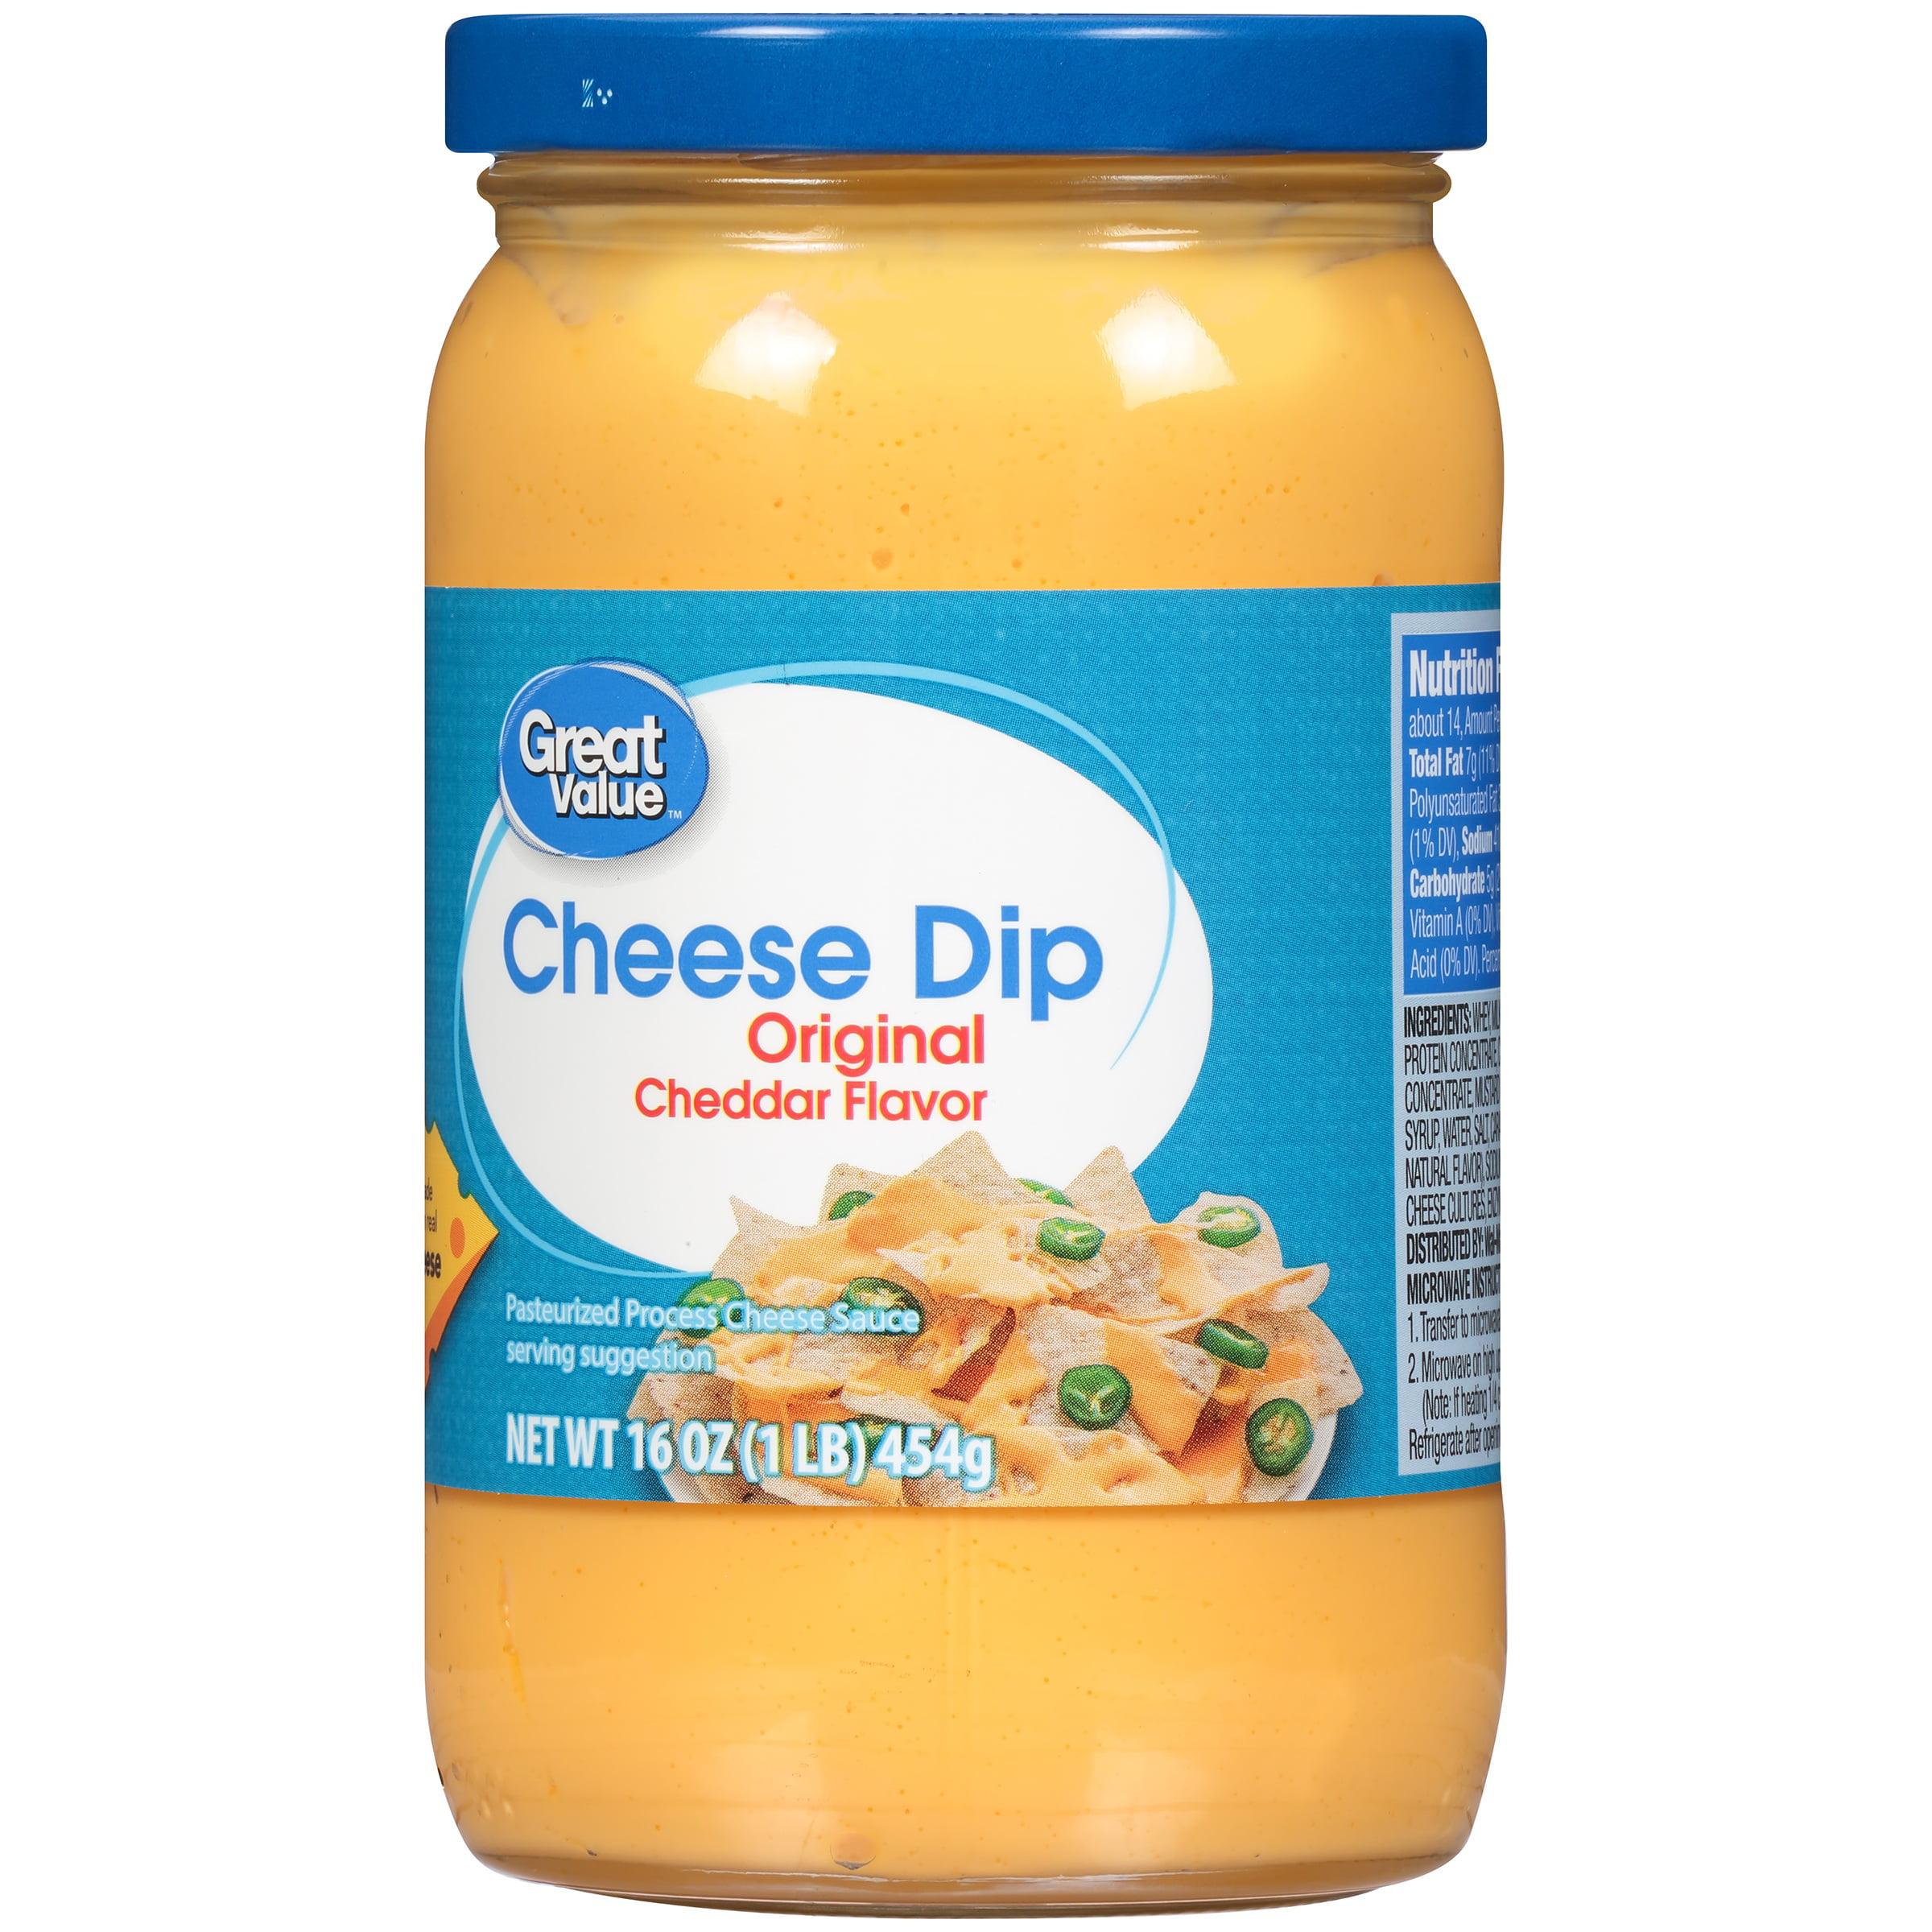 Great Value Cheese Dip, Cheddar Flavor, 16 oz - Walmart.com